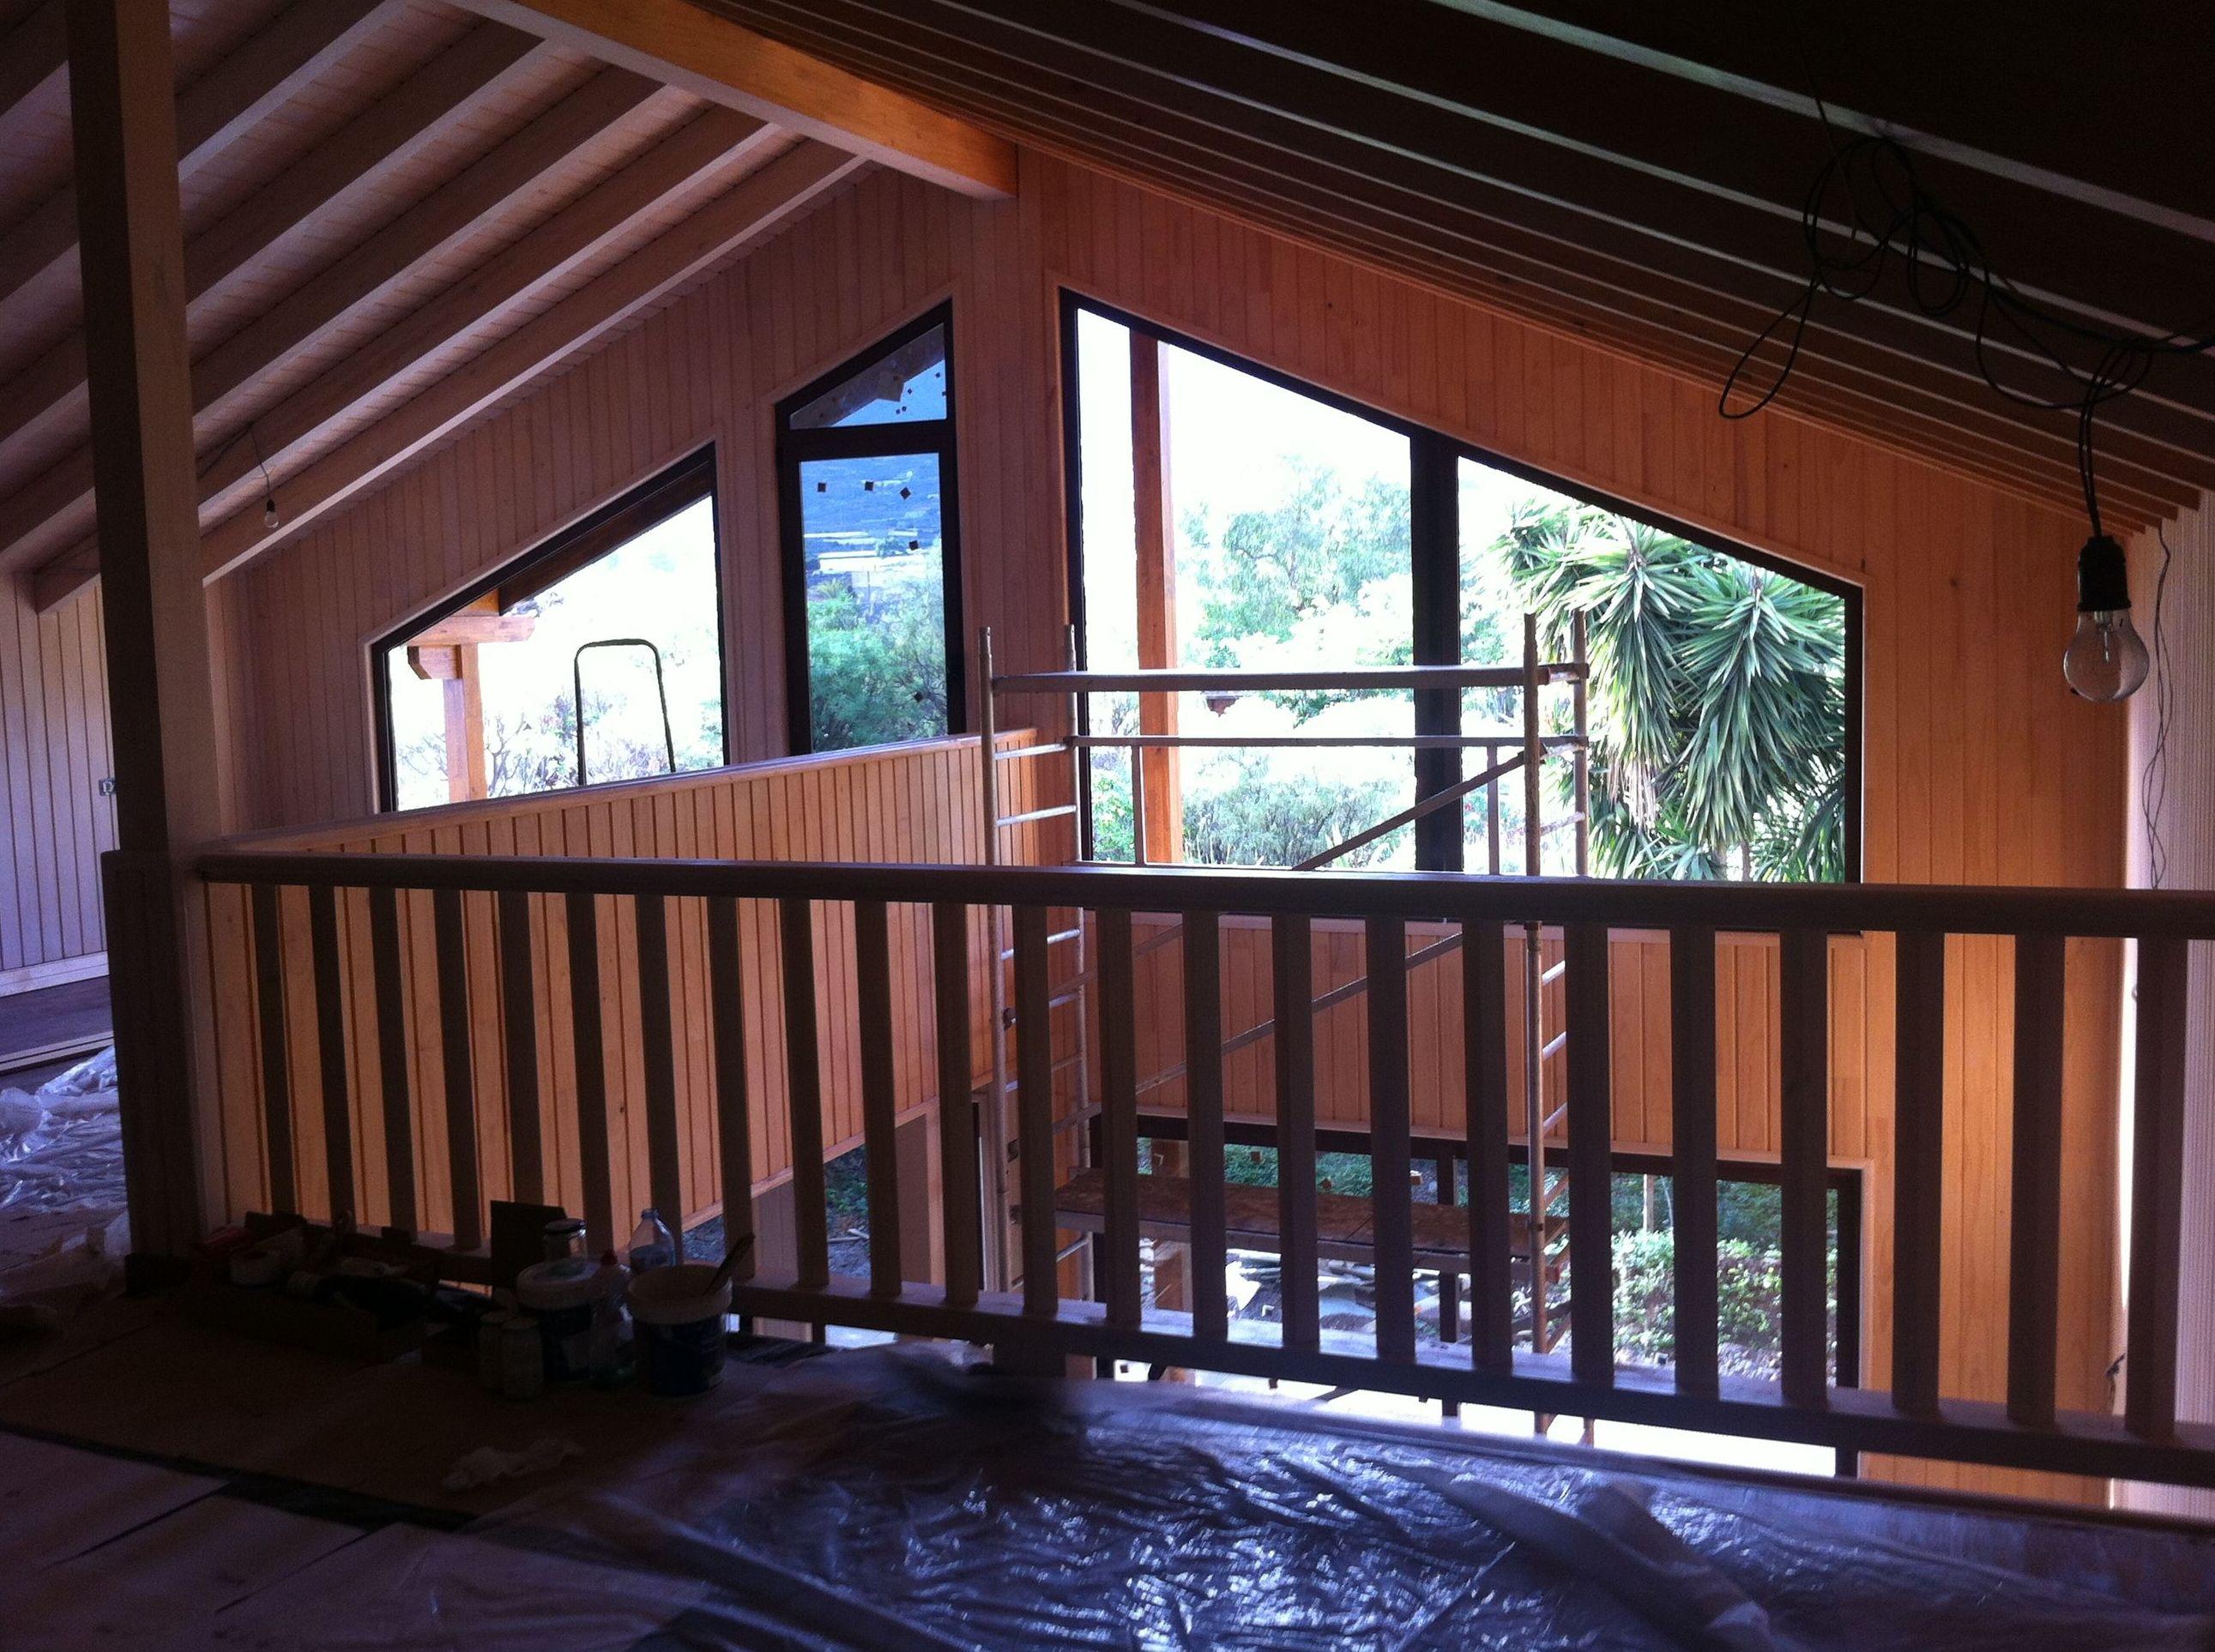 buhardilla loft madera tenerife